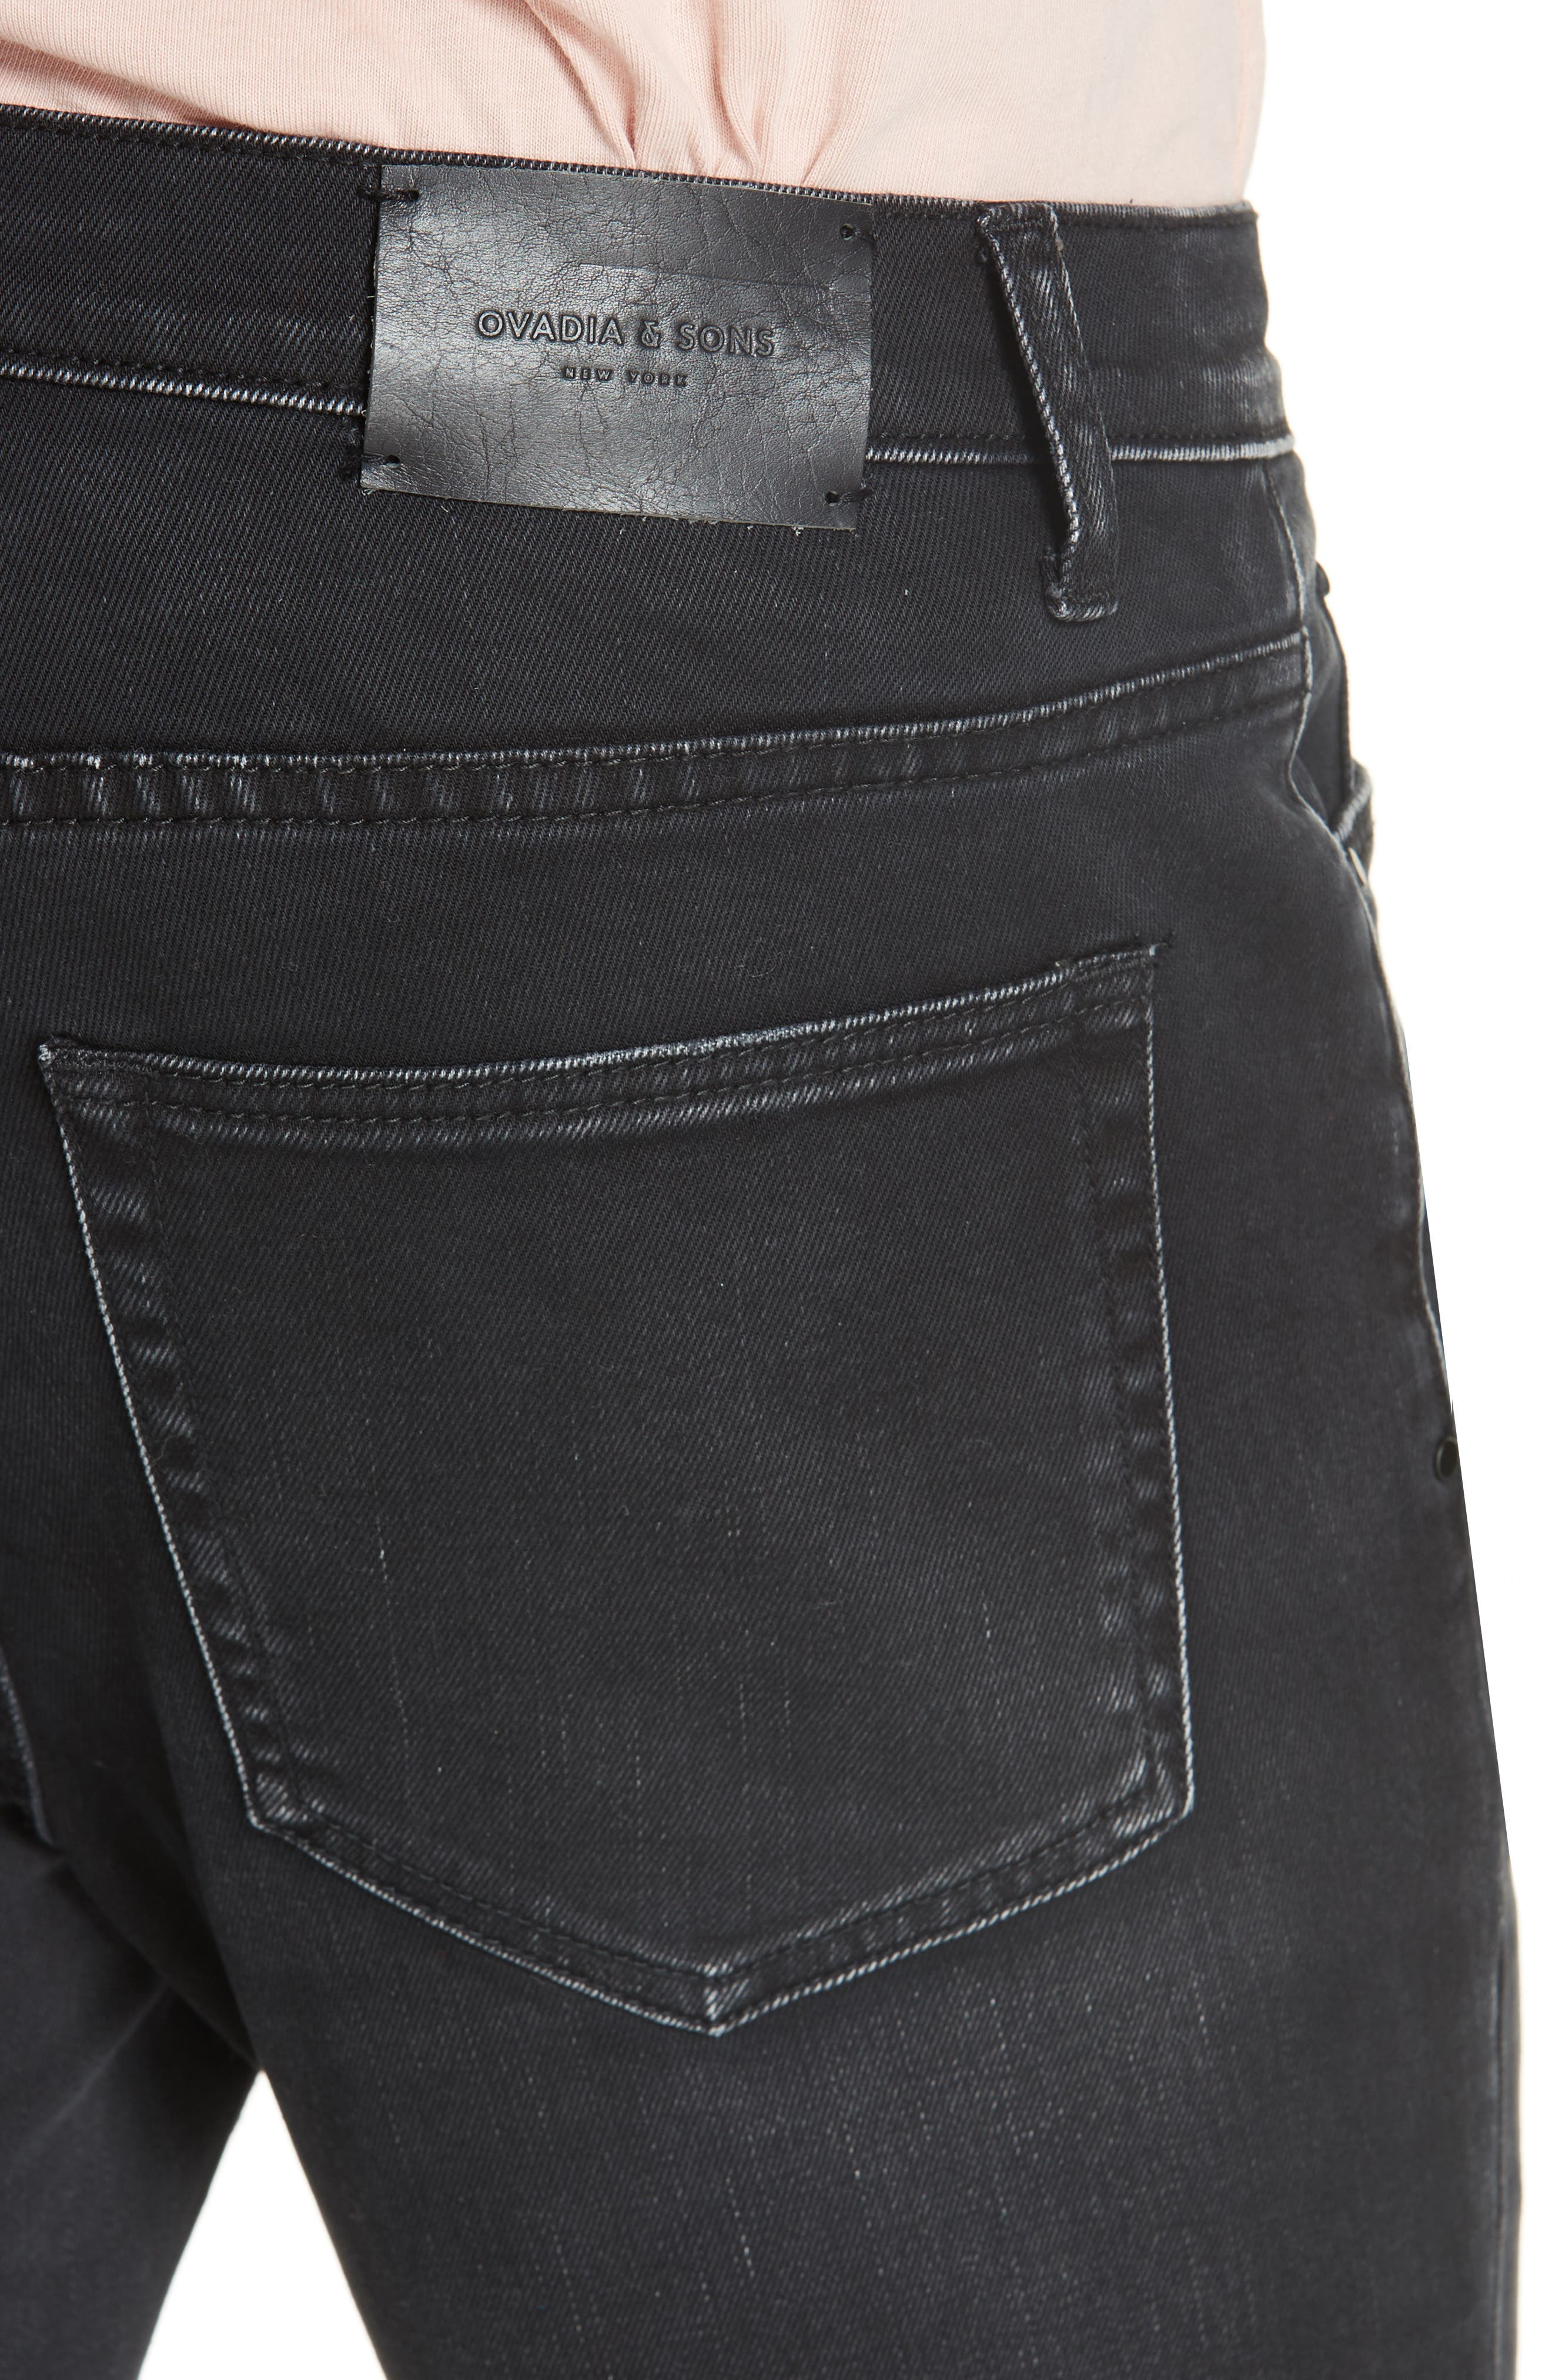 Distressed Slim Fit Jeans,                             Alternate thumbnail 4, color,                             BLACK